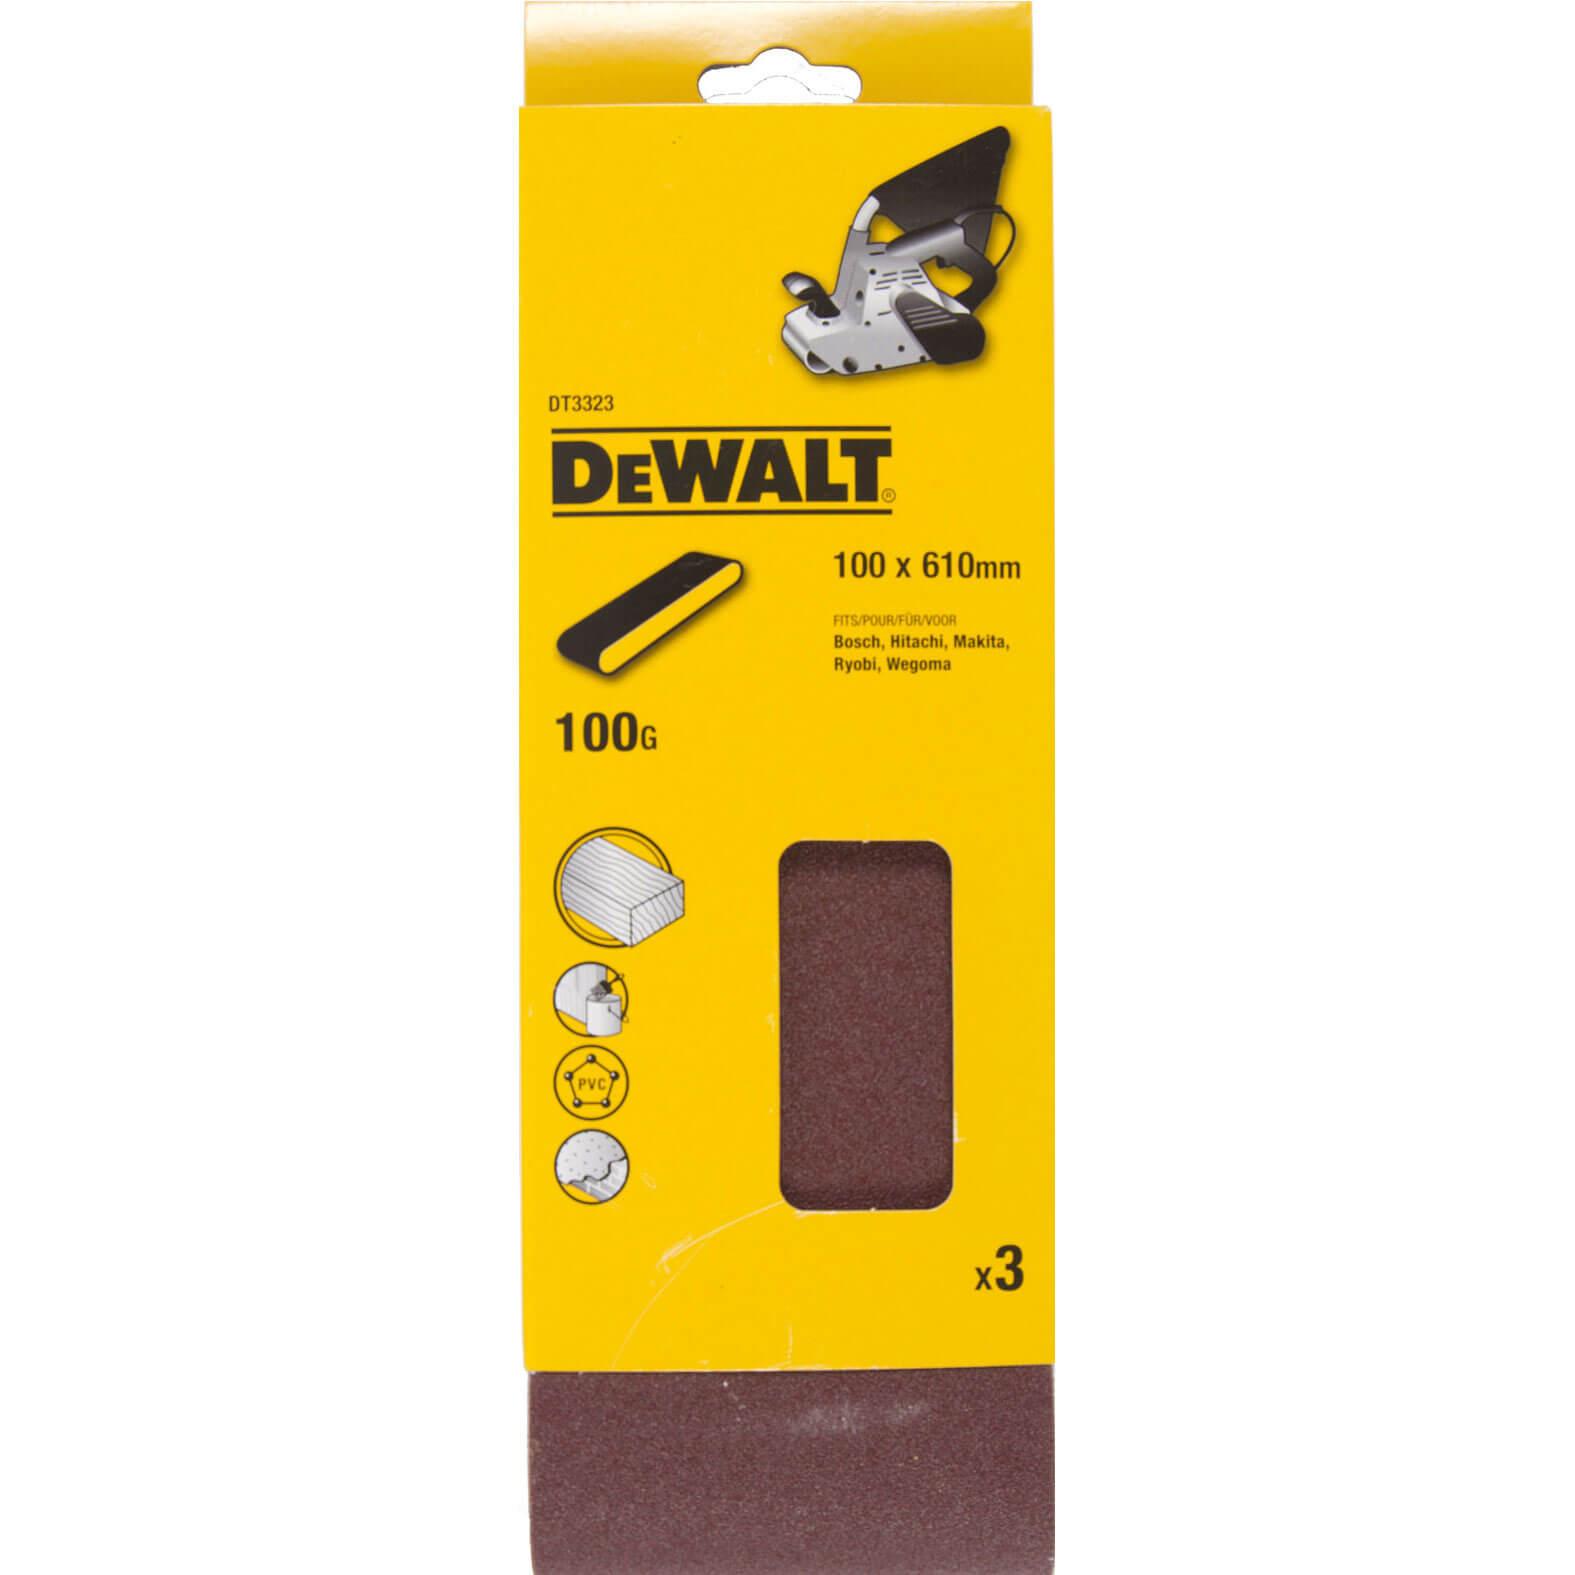 Image of DeWalt 100 x 610mm Multi Purpose Sanding Belts 100mm x 610mm 100g Pack of 3